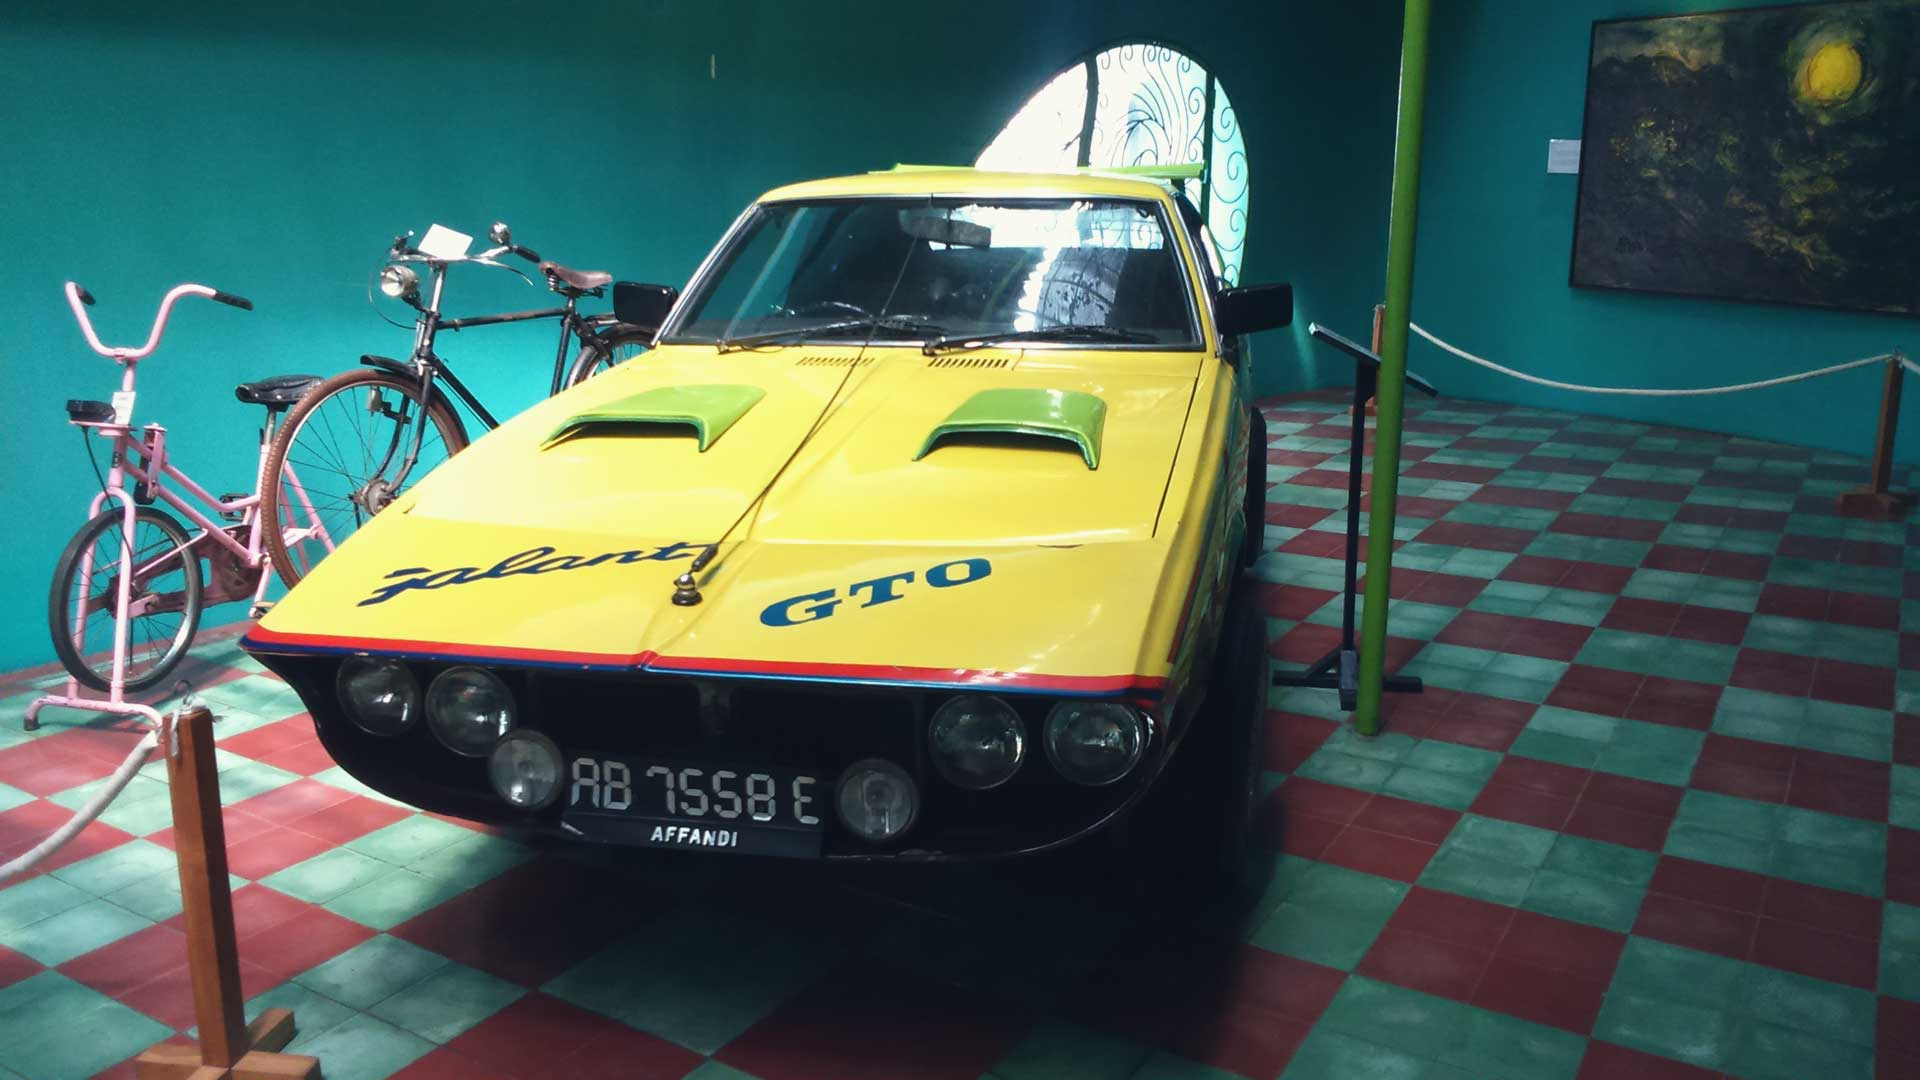 Mitsubishi Galant 1976 Affandi